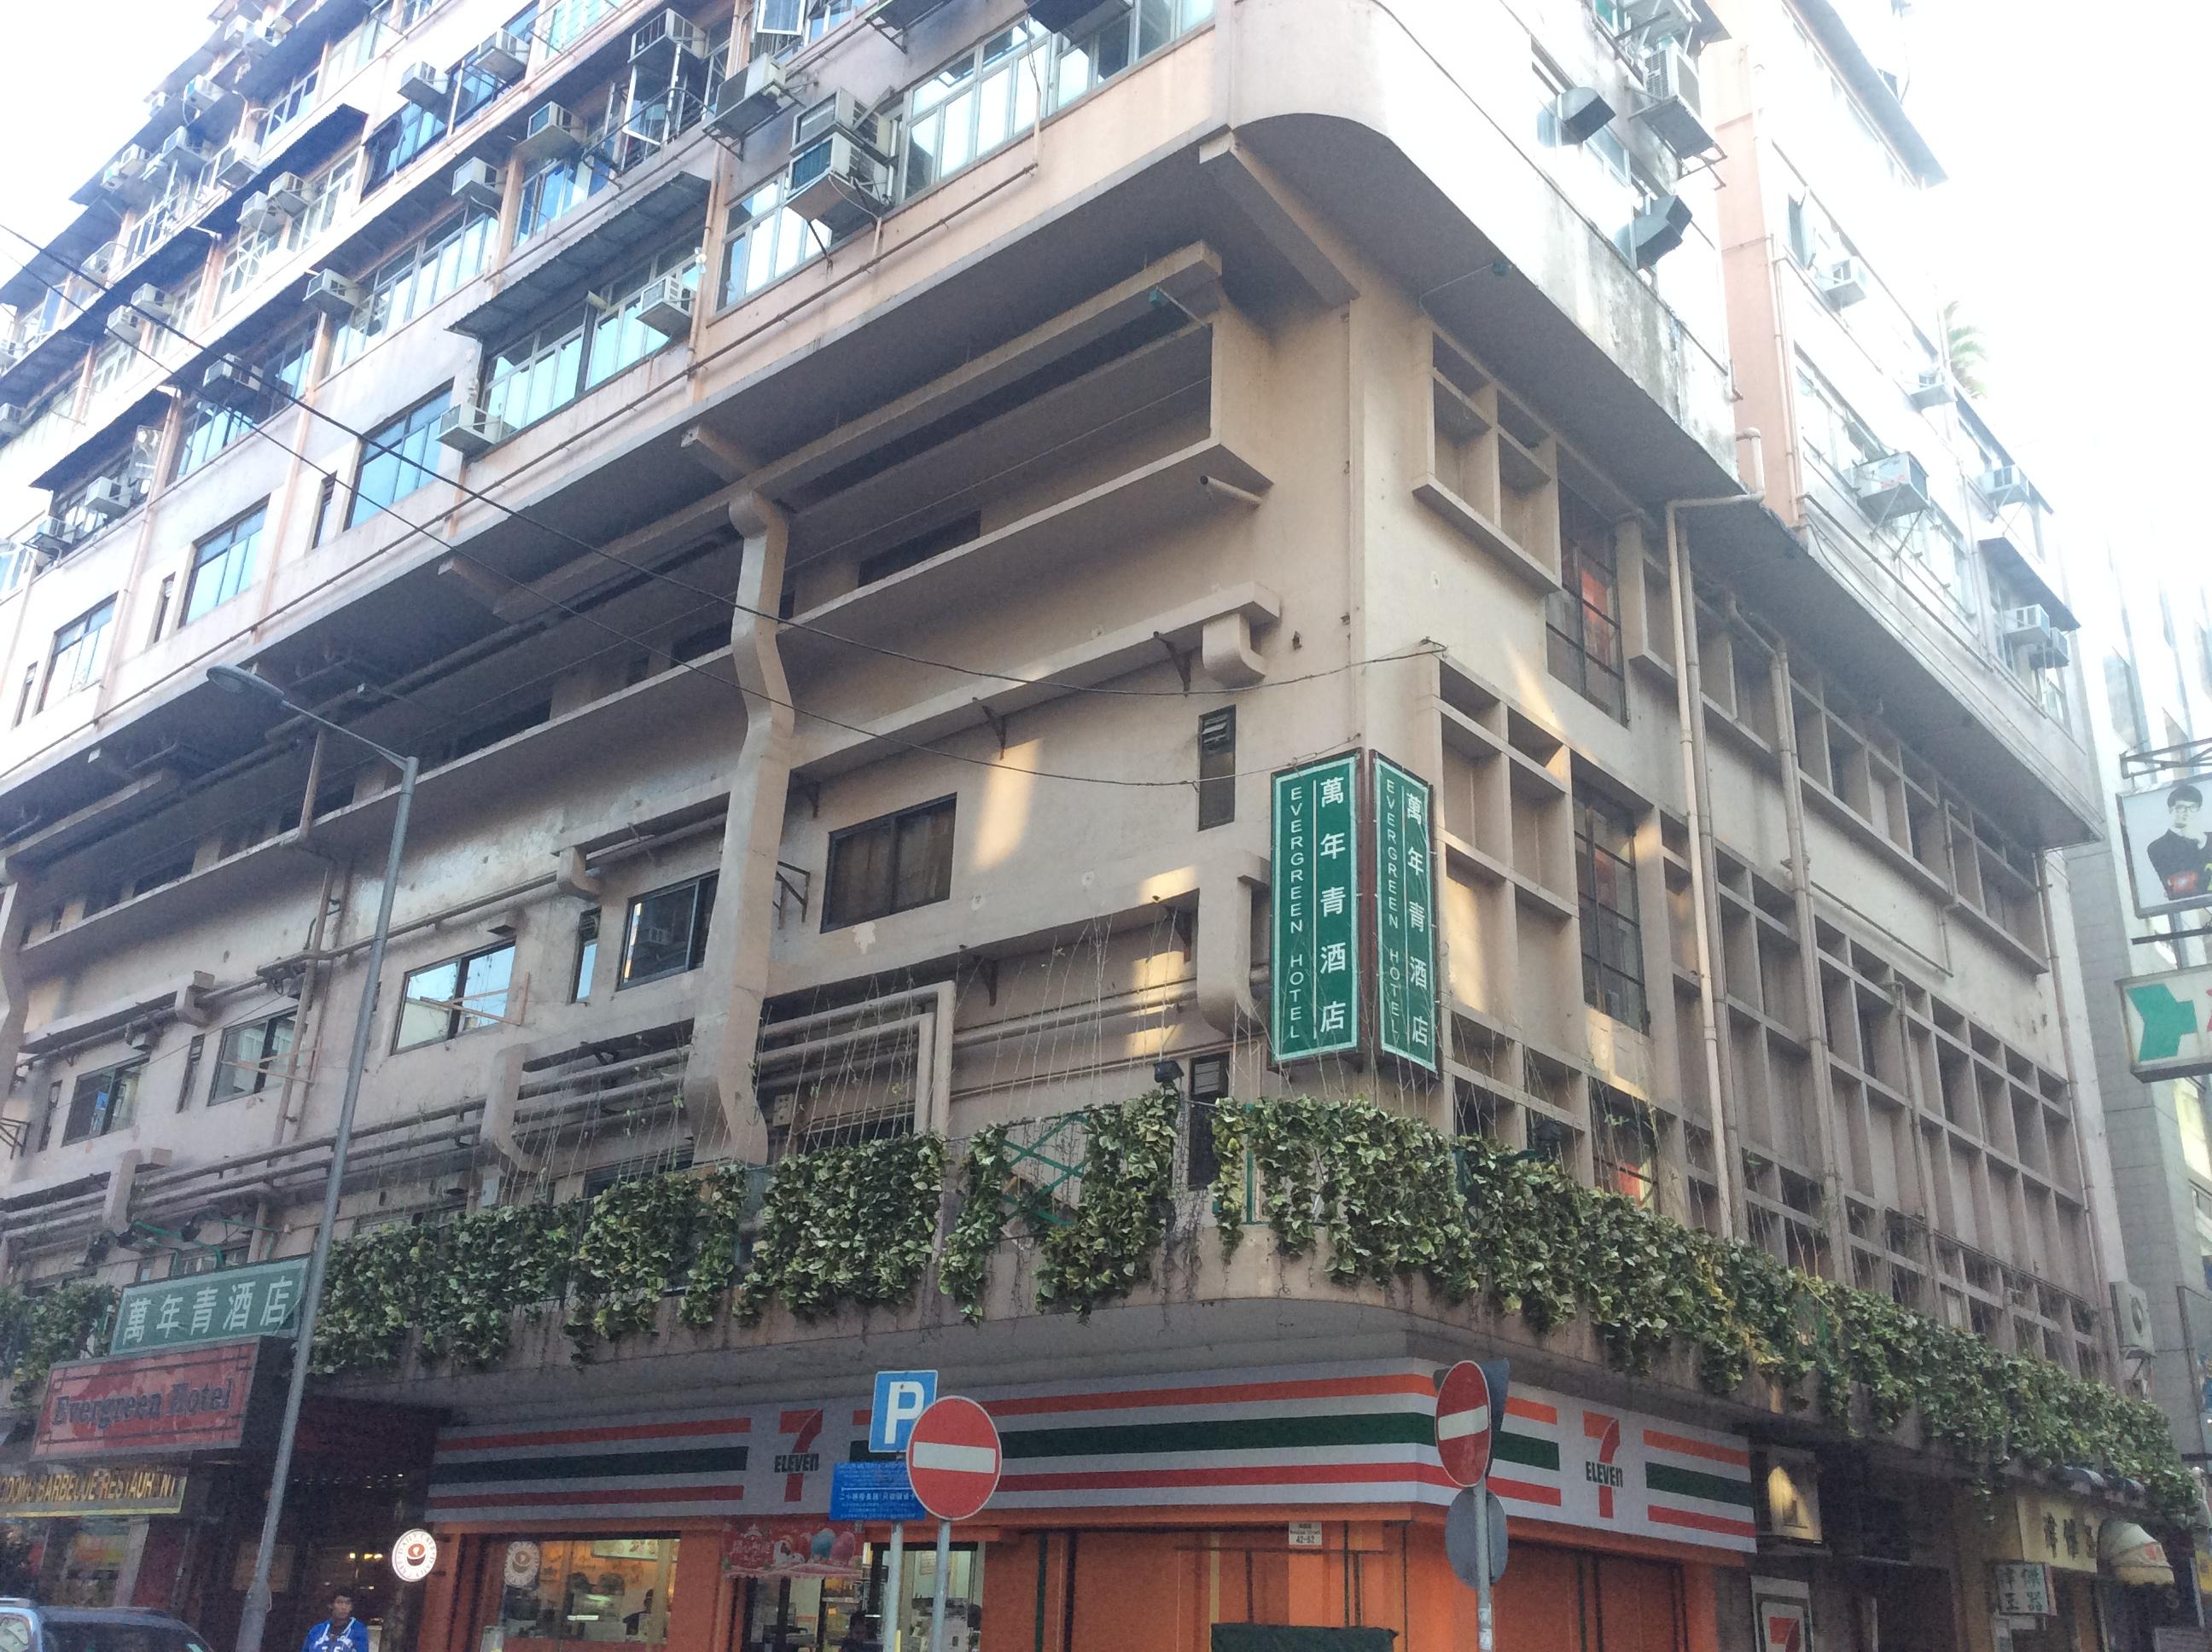 Hong Kong Part 2